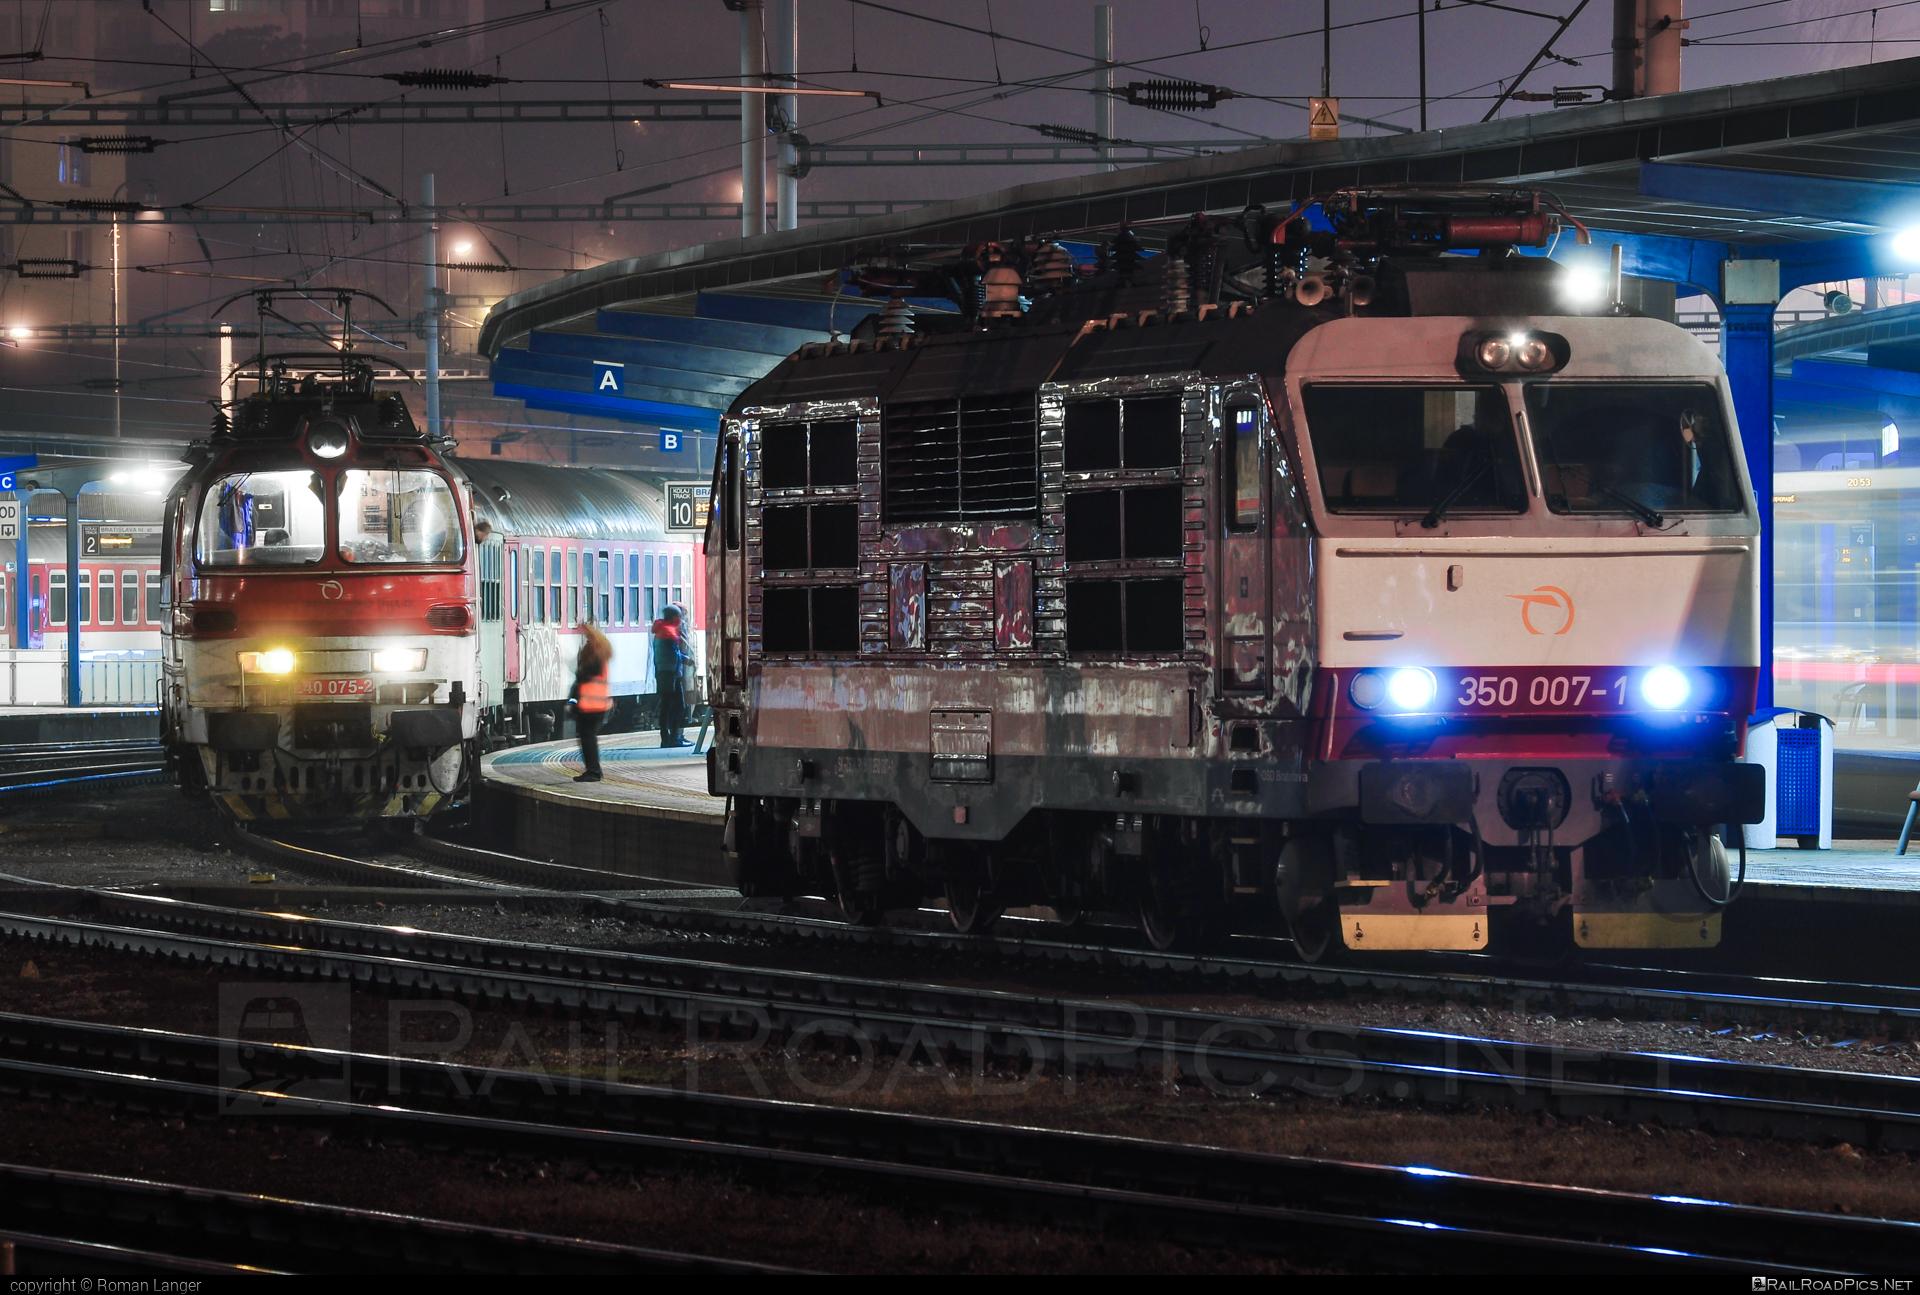 Škoda 55E - 350 007-1 operated by Železničná Spoločnost' Slovensko, a.s. #ZeleznicnaSpolocnostSlovensko #gorila #locomotive350 #skoda #skoda55e #zssk